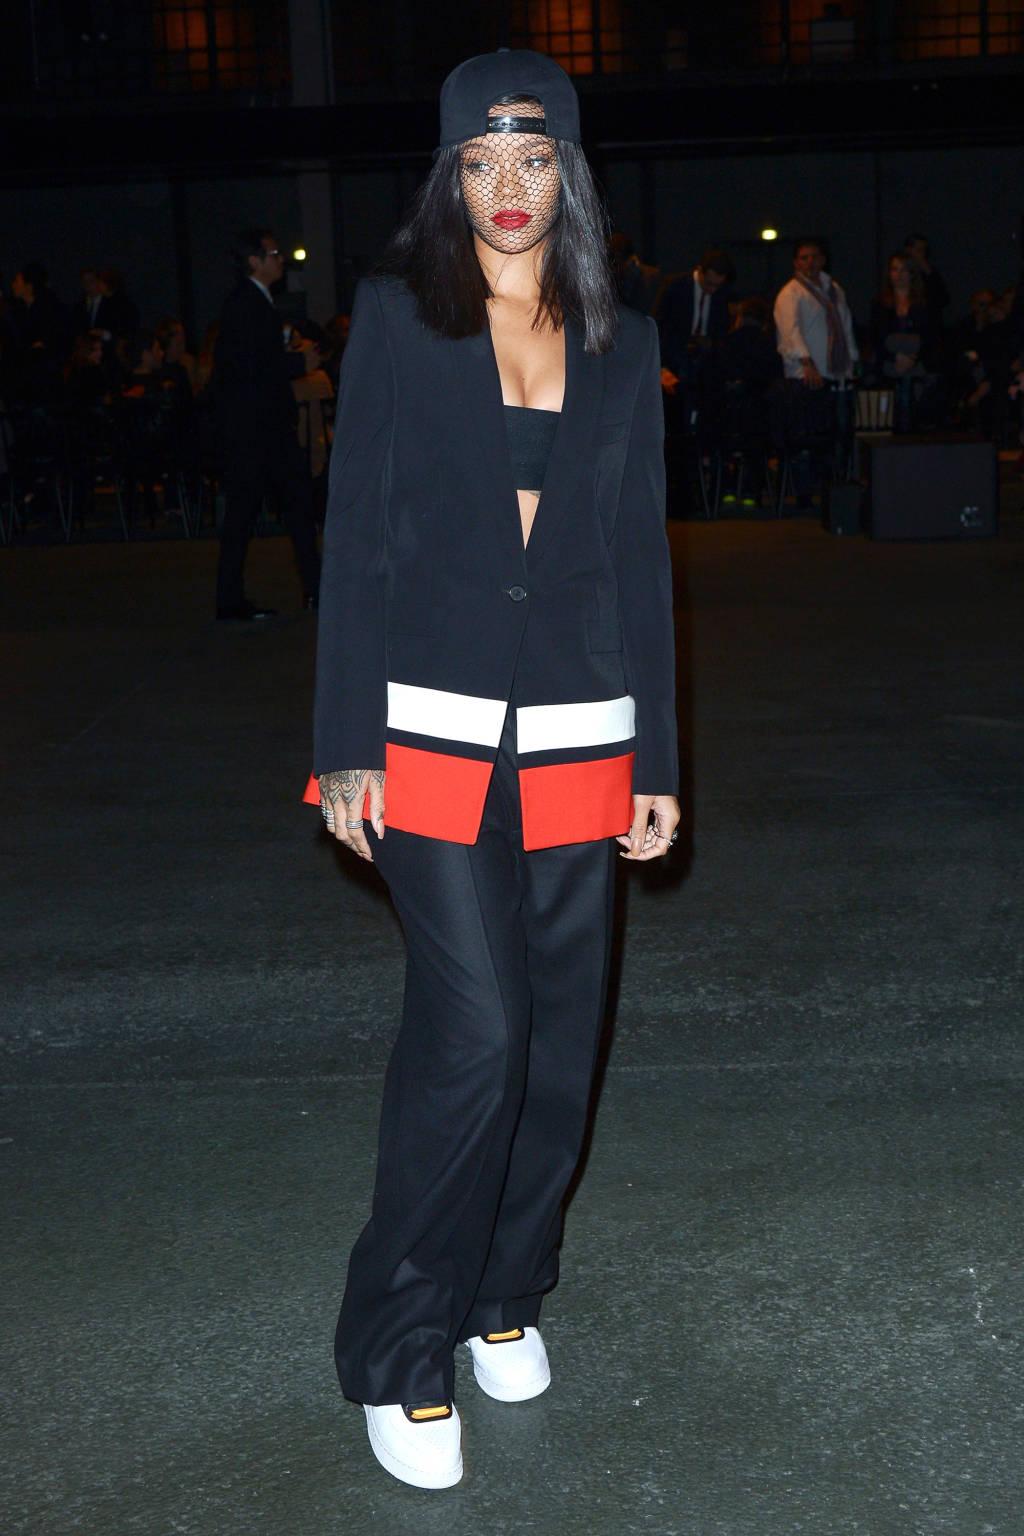 Louis Vuitton AW14, Paris Fashion Week advise